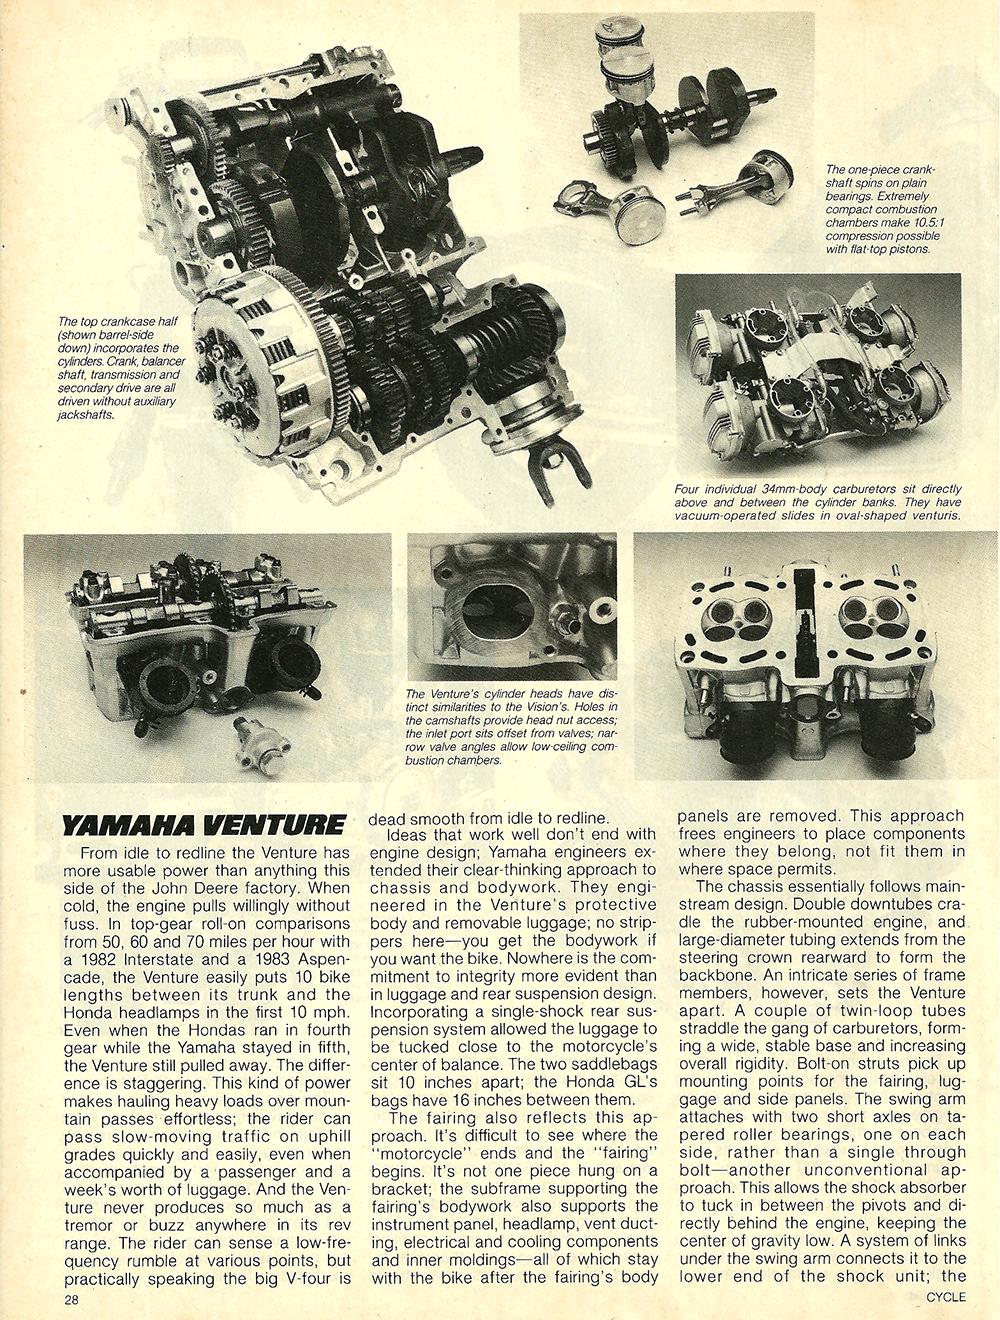 1983 Yamaha XVZ12TK Venture road test 07.jpg